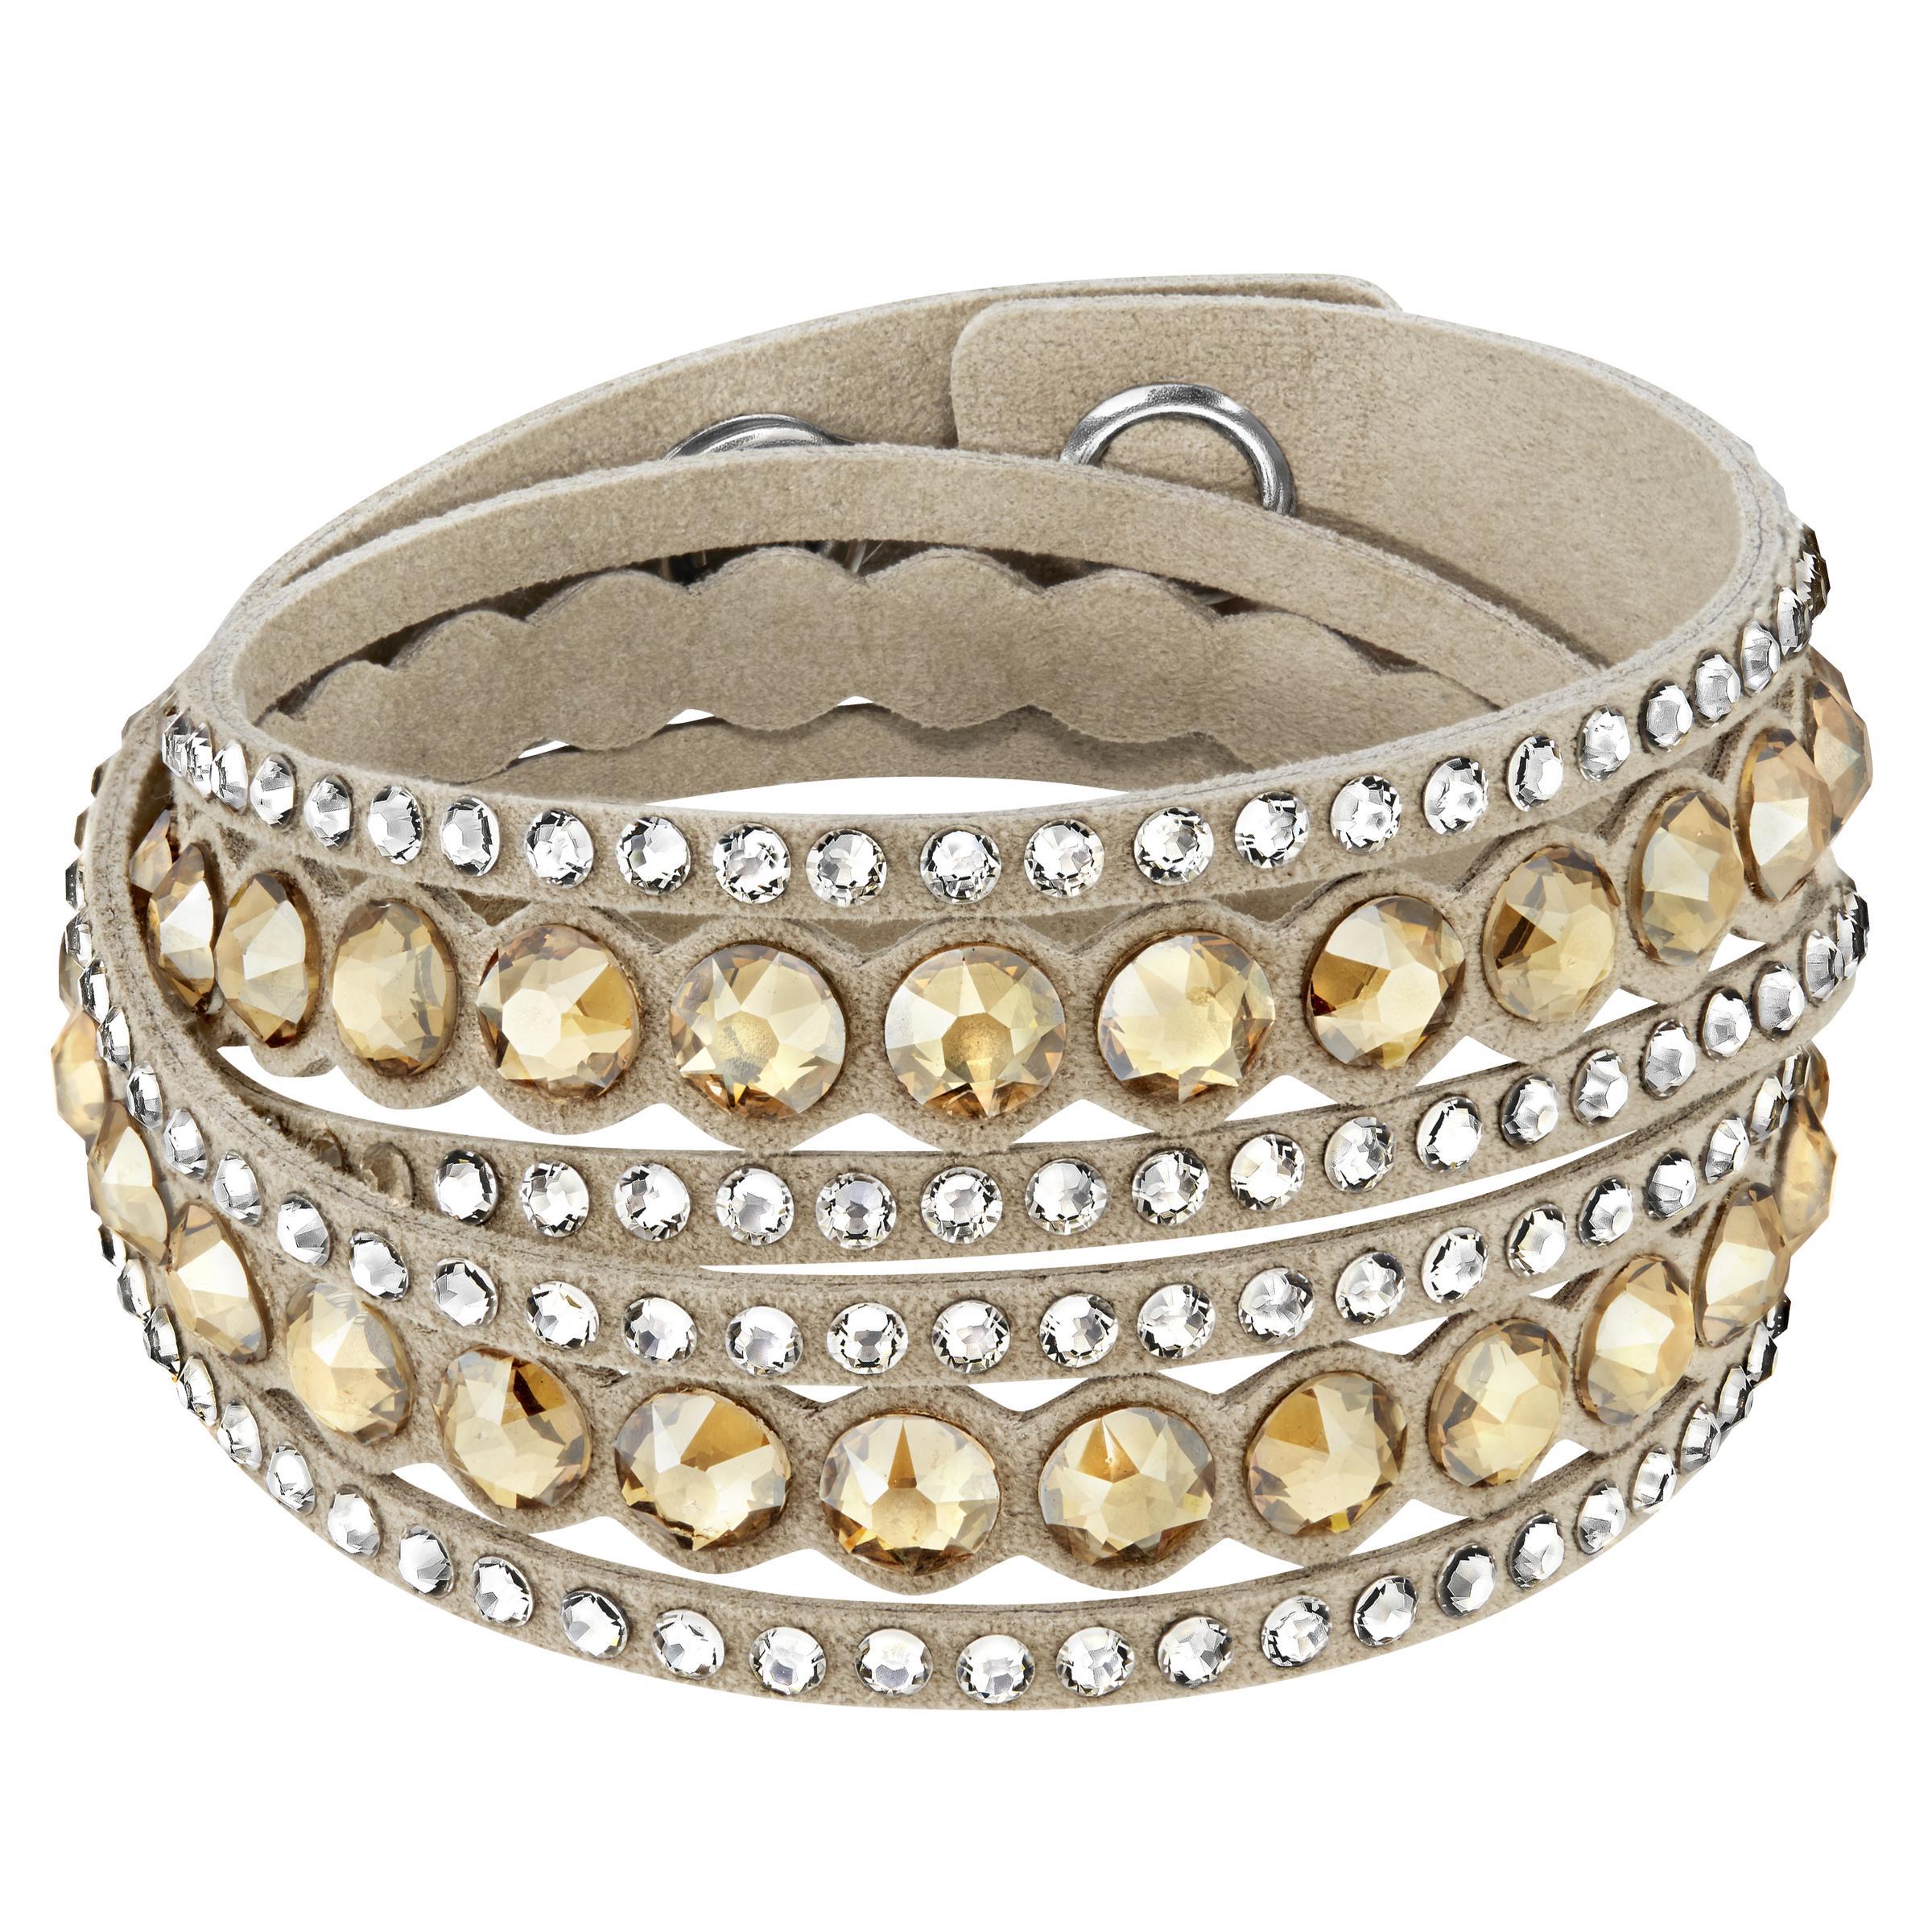 bracelet femme beige